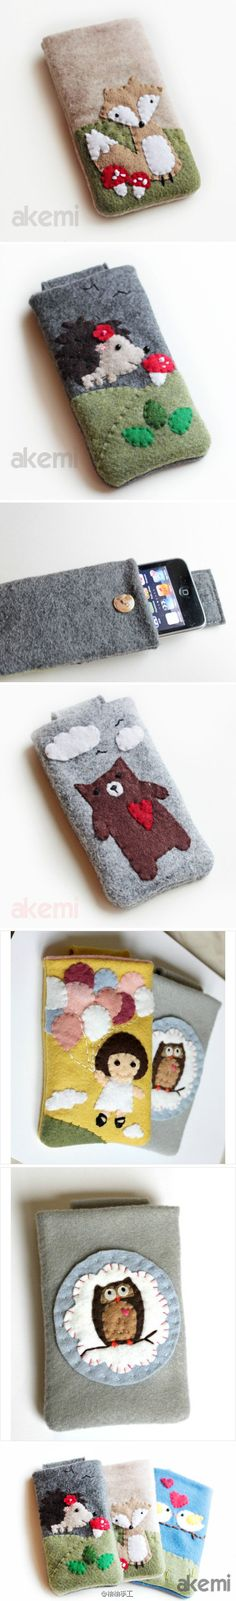 Cute felt patch iphone sets